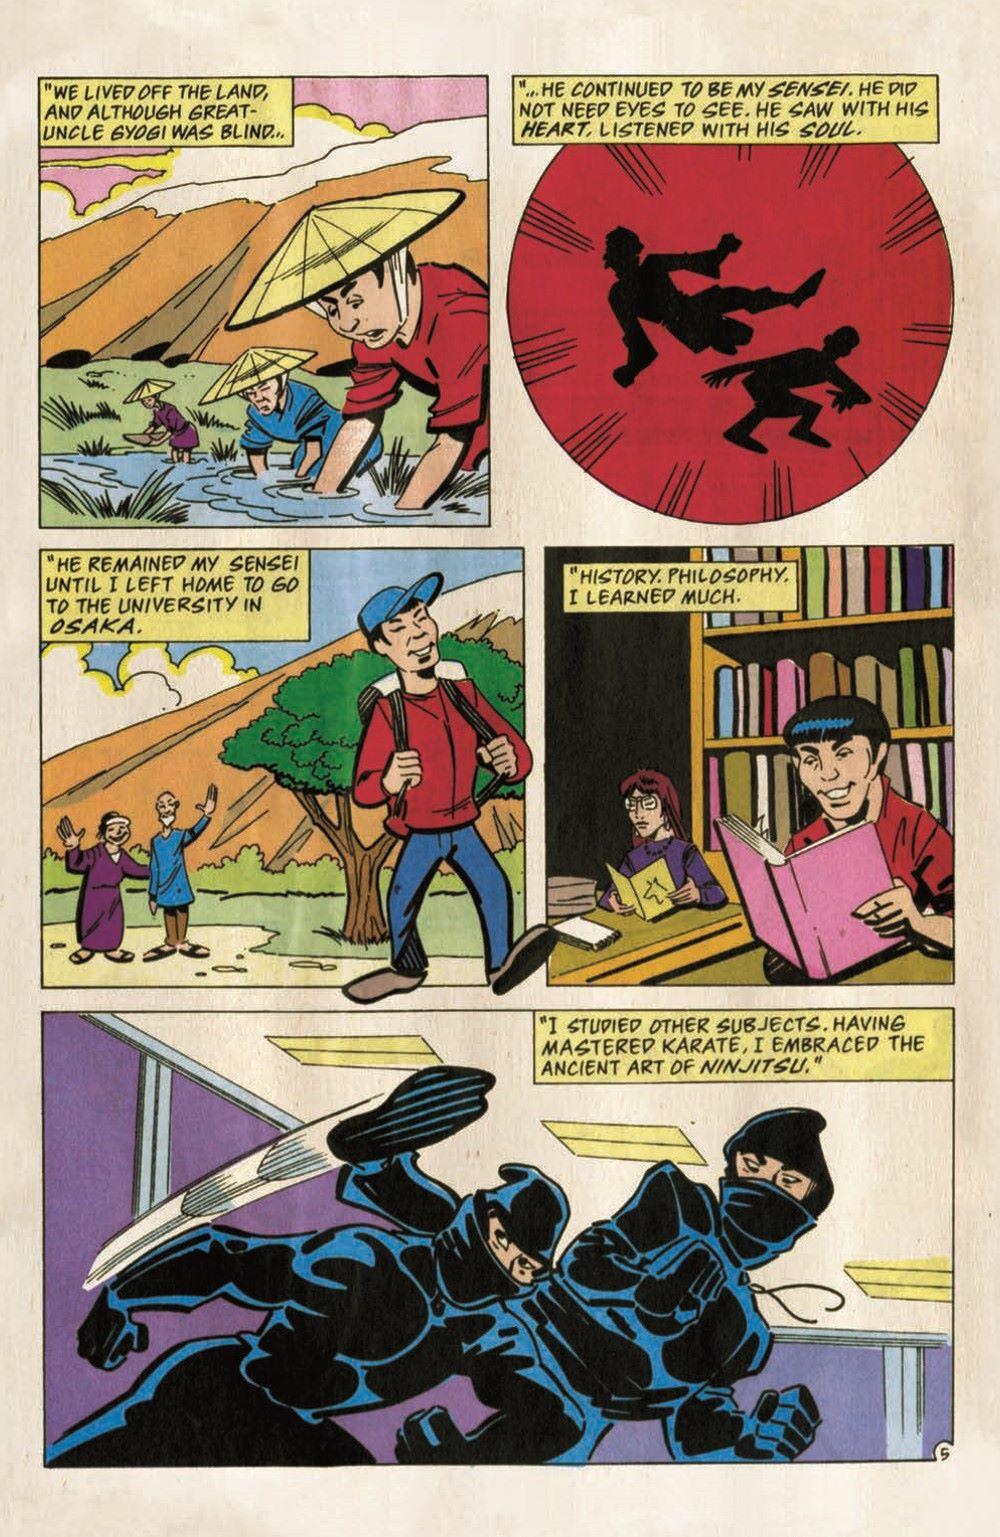 TMNT-Bestof-Splinter_pr-7 ComicList Previews: TEENAGE MUTANT NINJA TURTLES BEST OF SPLINTER #1